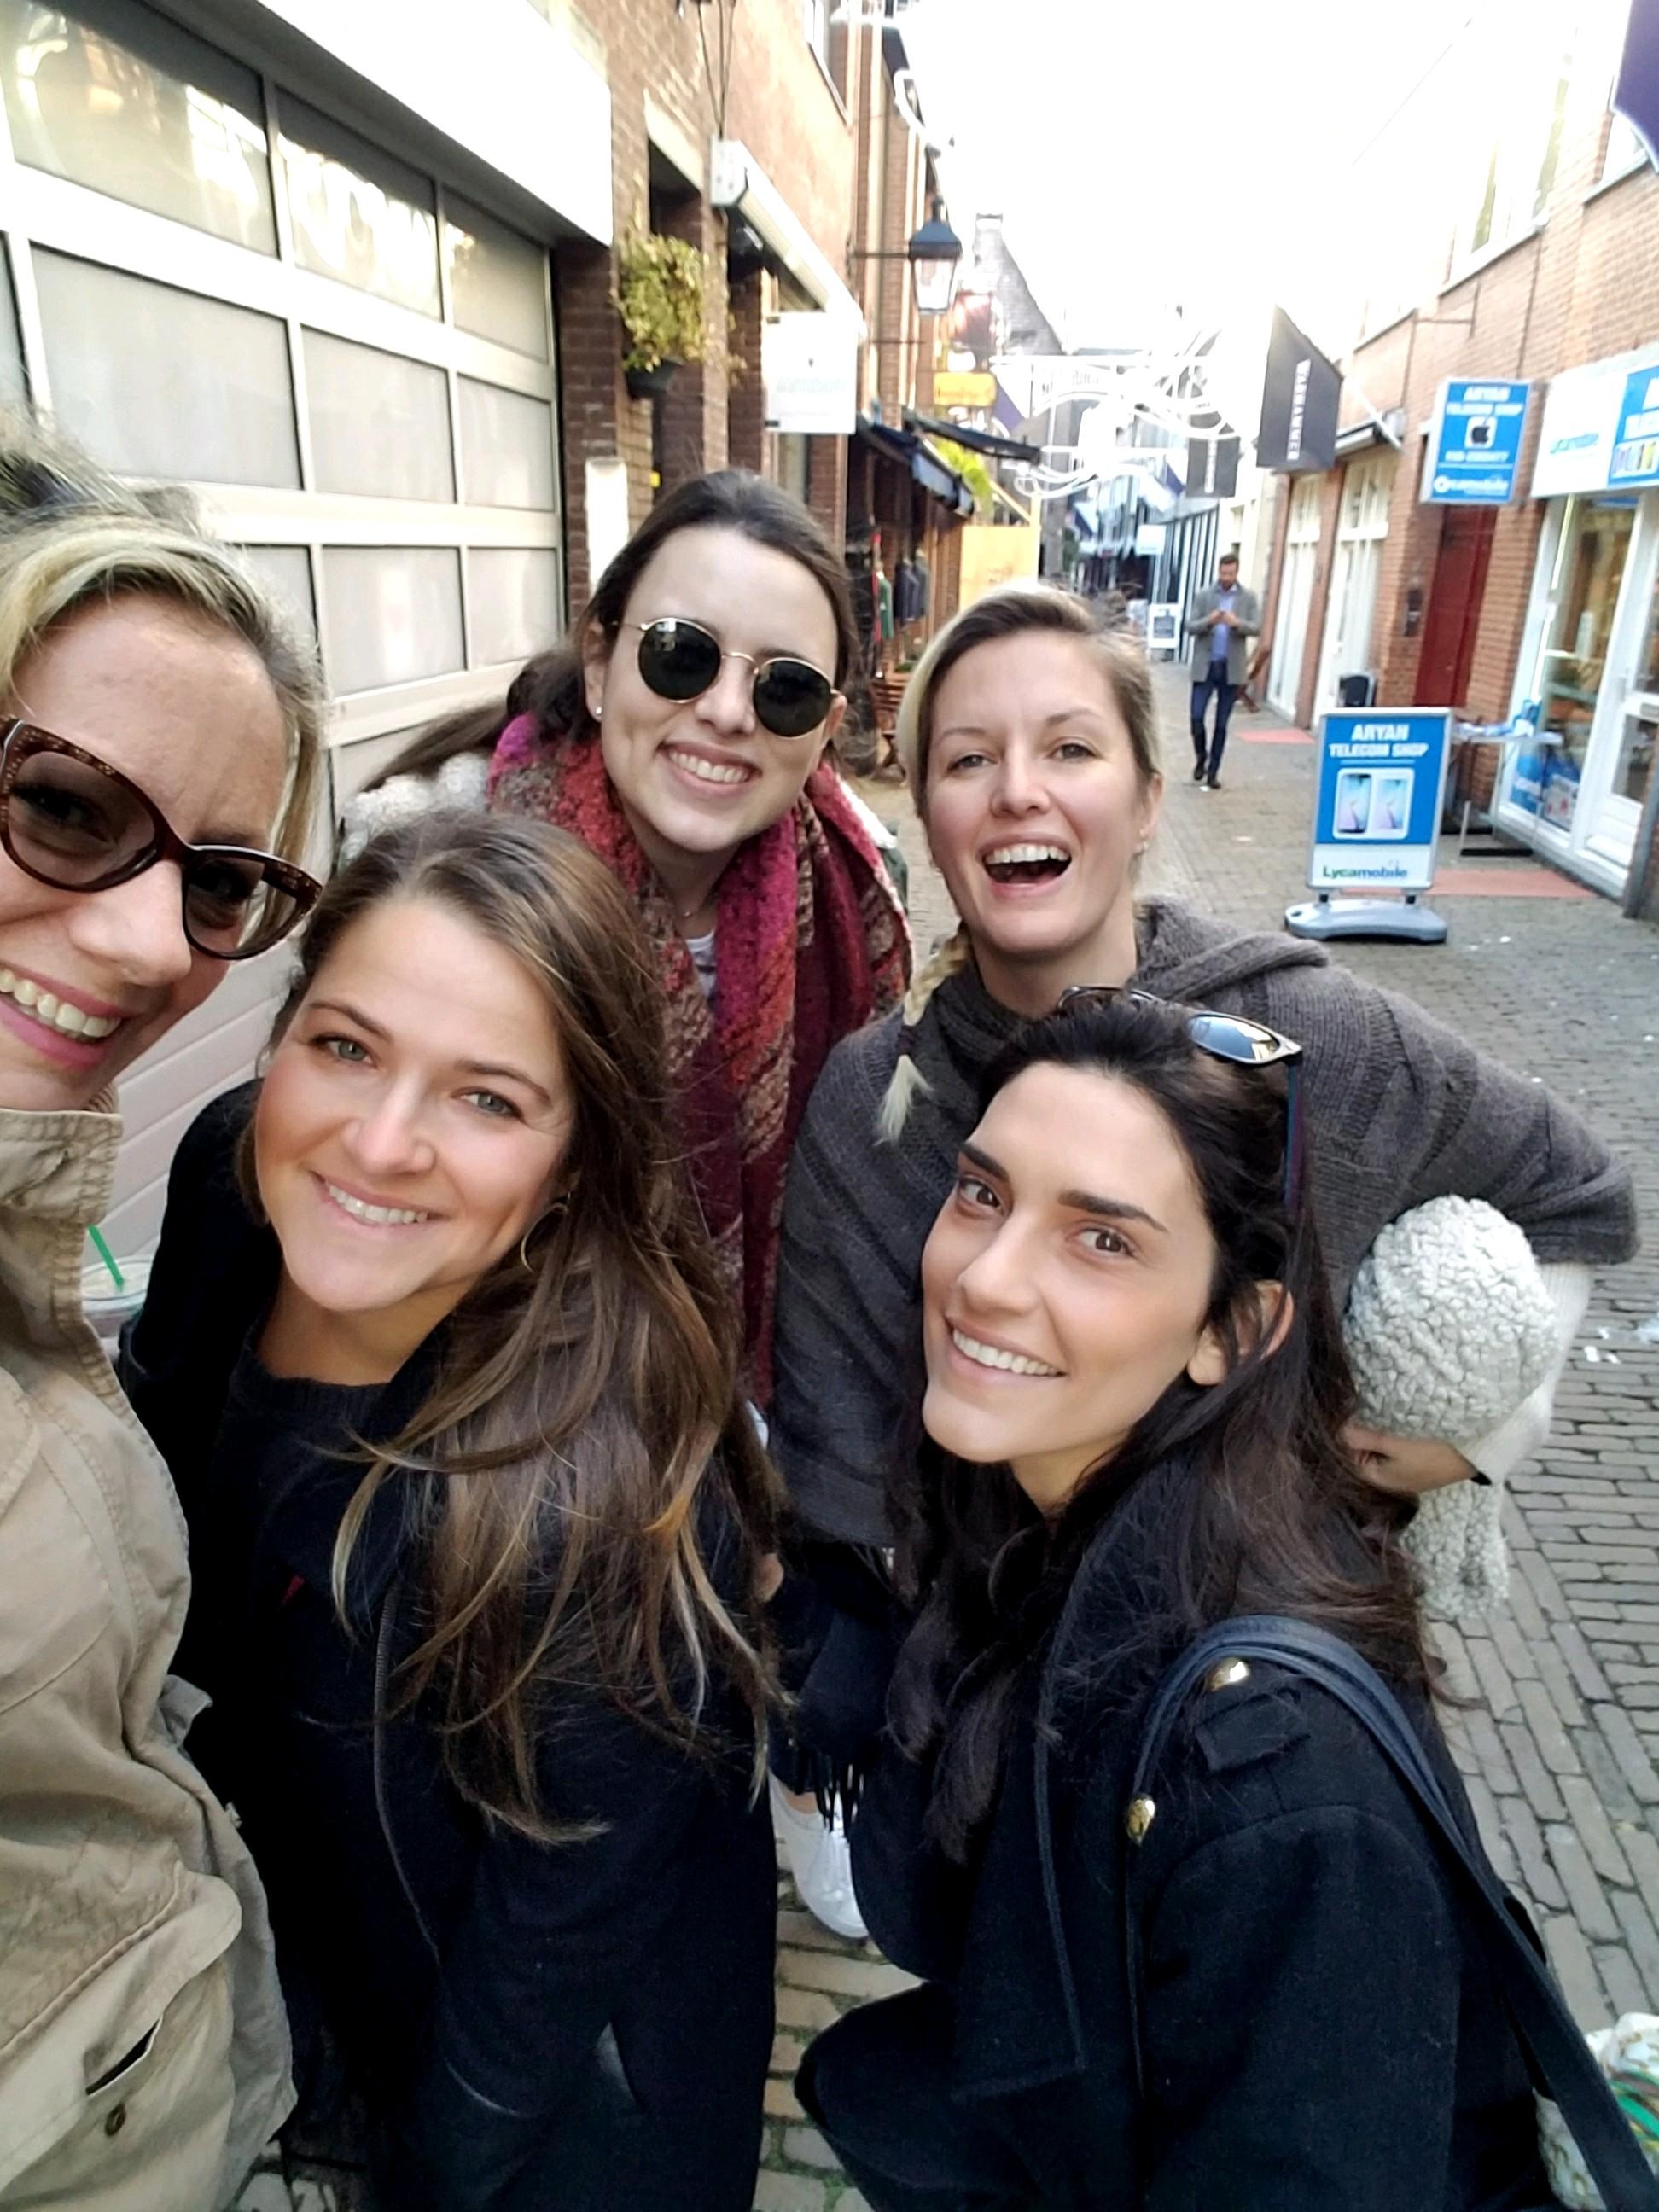 Utrecht Alley - The Kissters